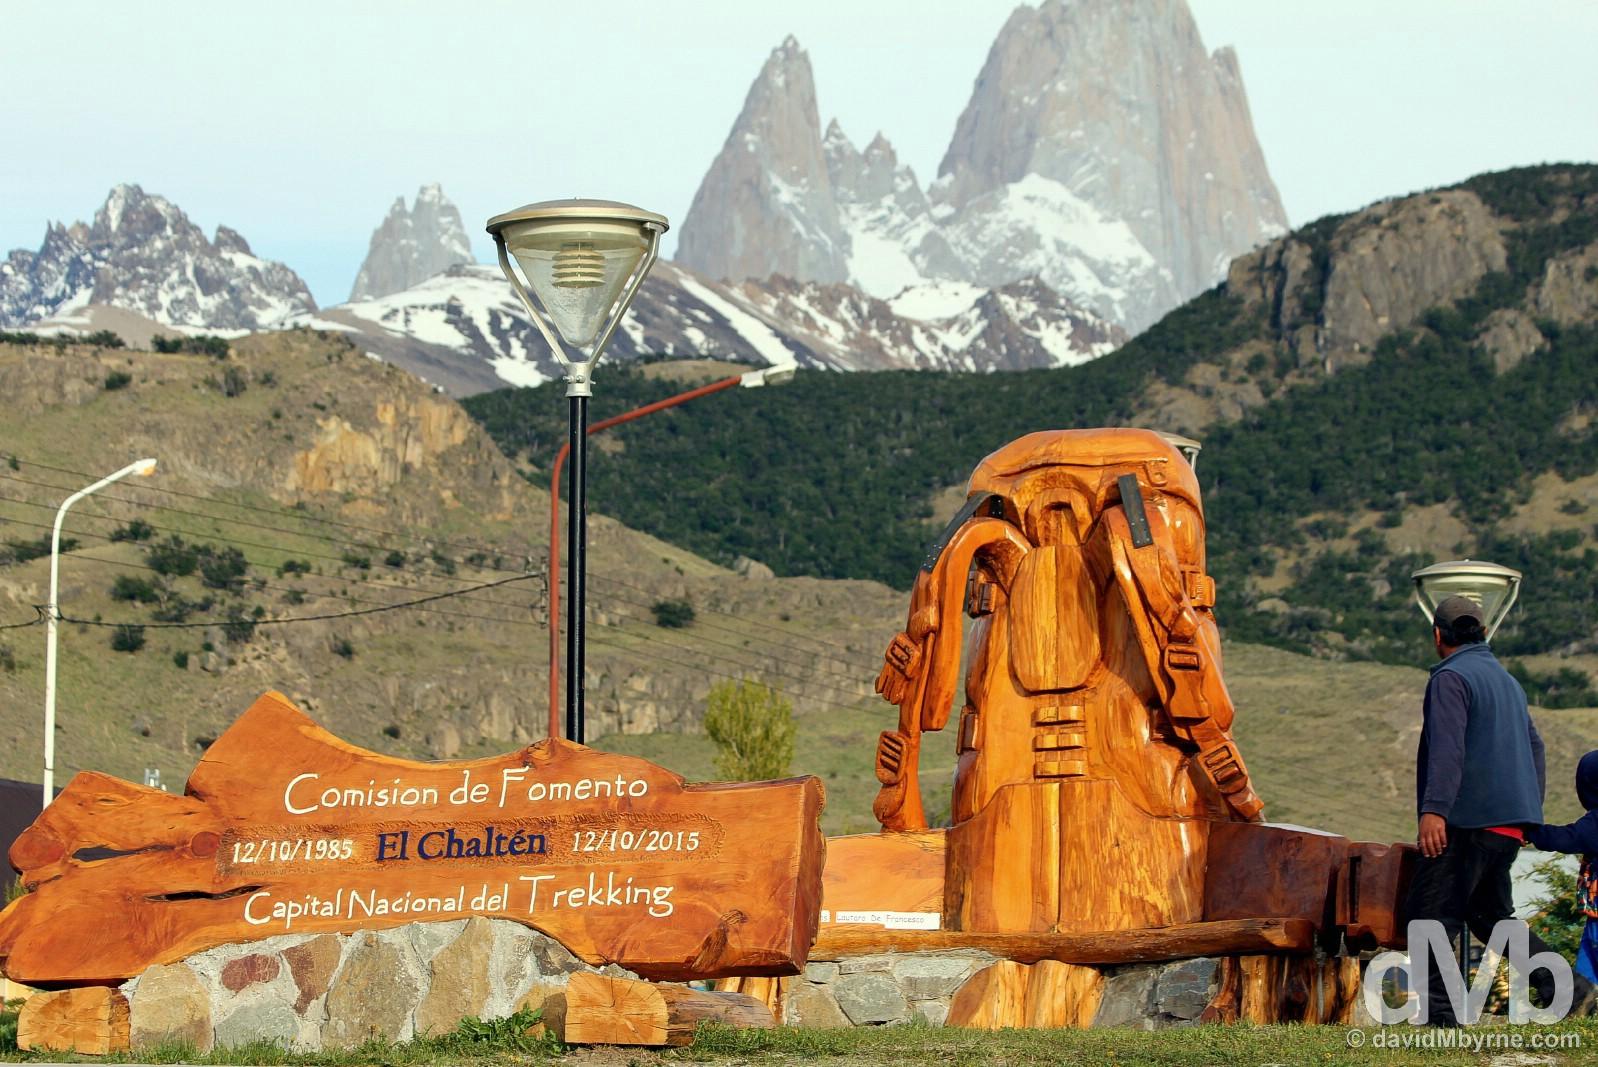 Avenida M. M. Guemes, El Chalten, southern Patagonia, Argentina. November 5, 2015.